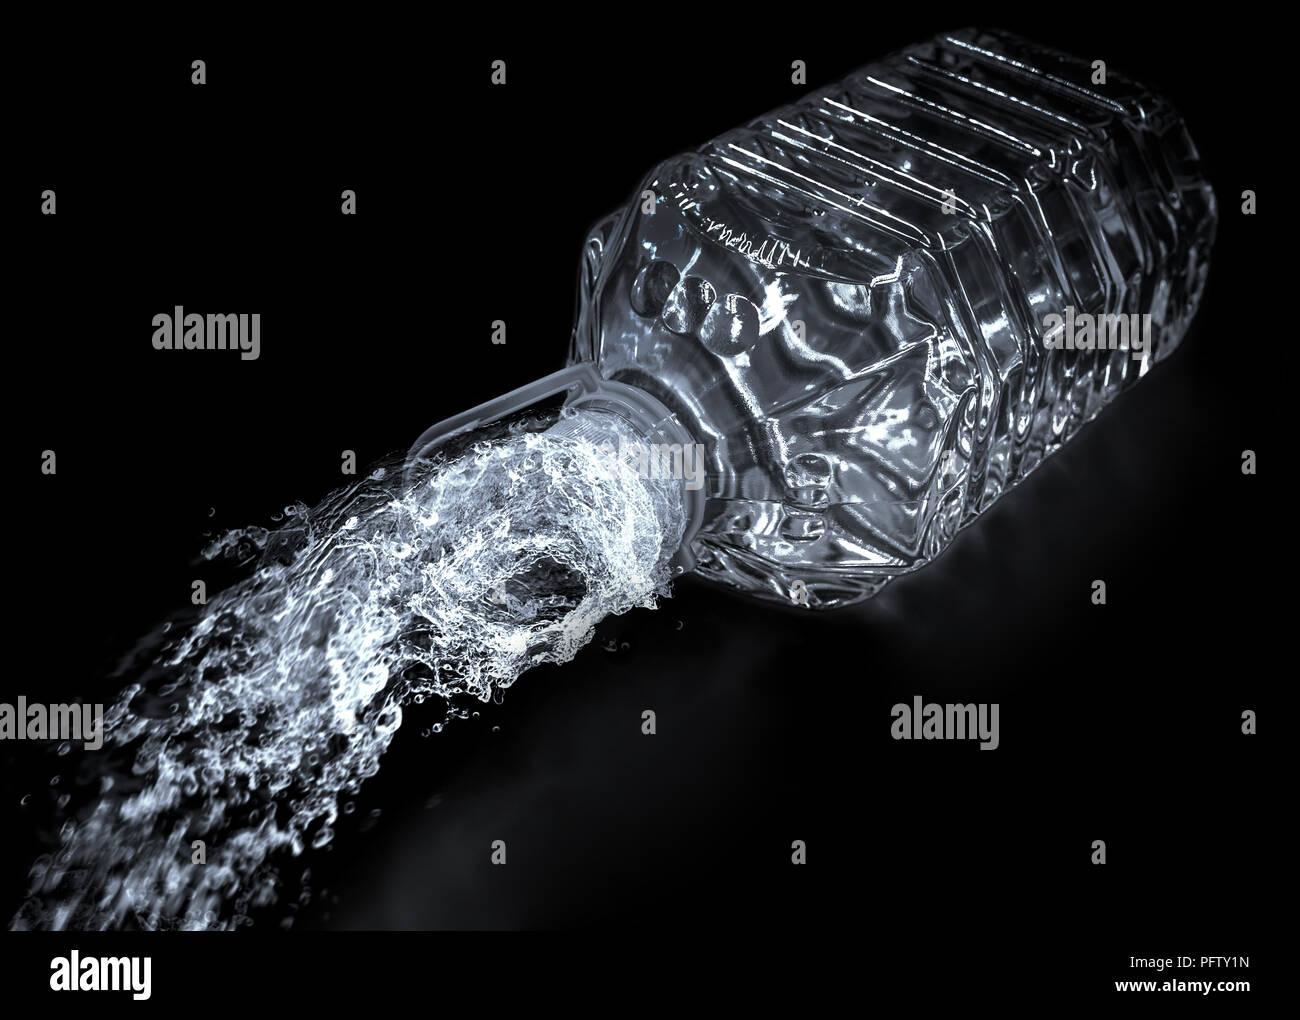 opened bottled water in dark - Stock Image